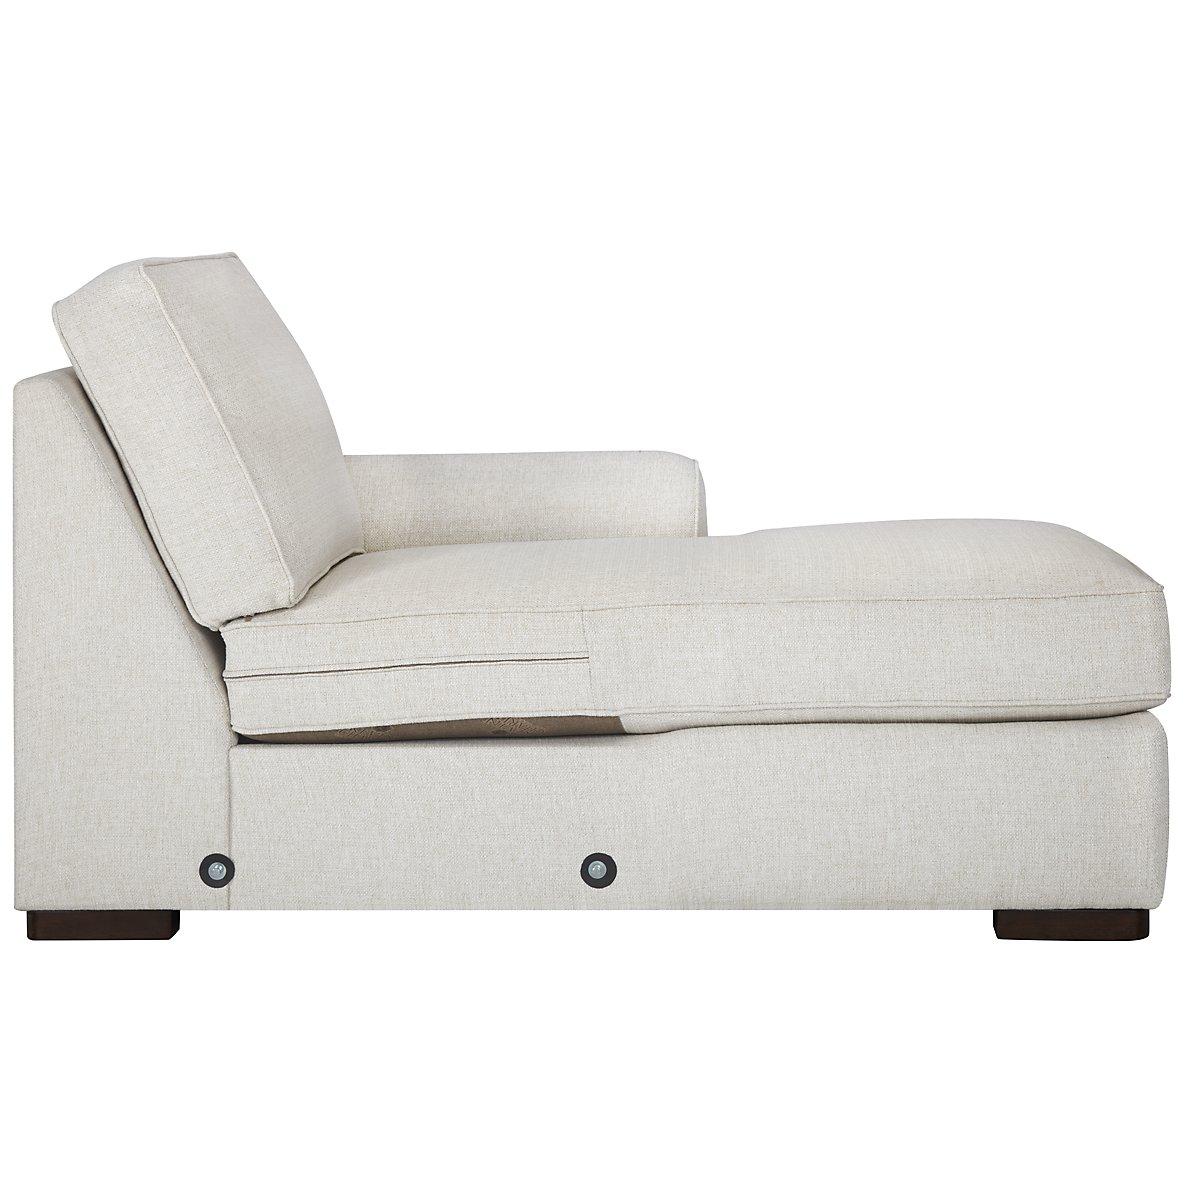 City Furniture: Austin White Fabric Large Right Chaise Sectional on pillow sofa, chair sofa, table sofa, bedroom sofa, couch sofa, mattress sofa, bench sofa, storage sofa, lounge sofa, fabric sofa, bookcase sofa, cushions sofa, futon sofa, art sofa, ottoman sofa, divan sofa, settee sofa, glider sofa, beds sofa, recliner sofa,